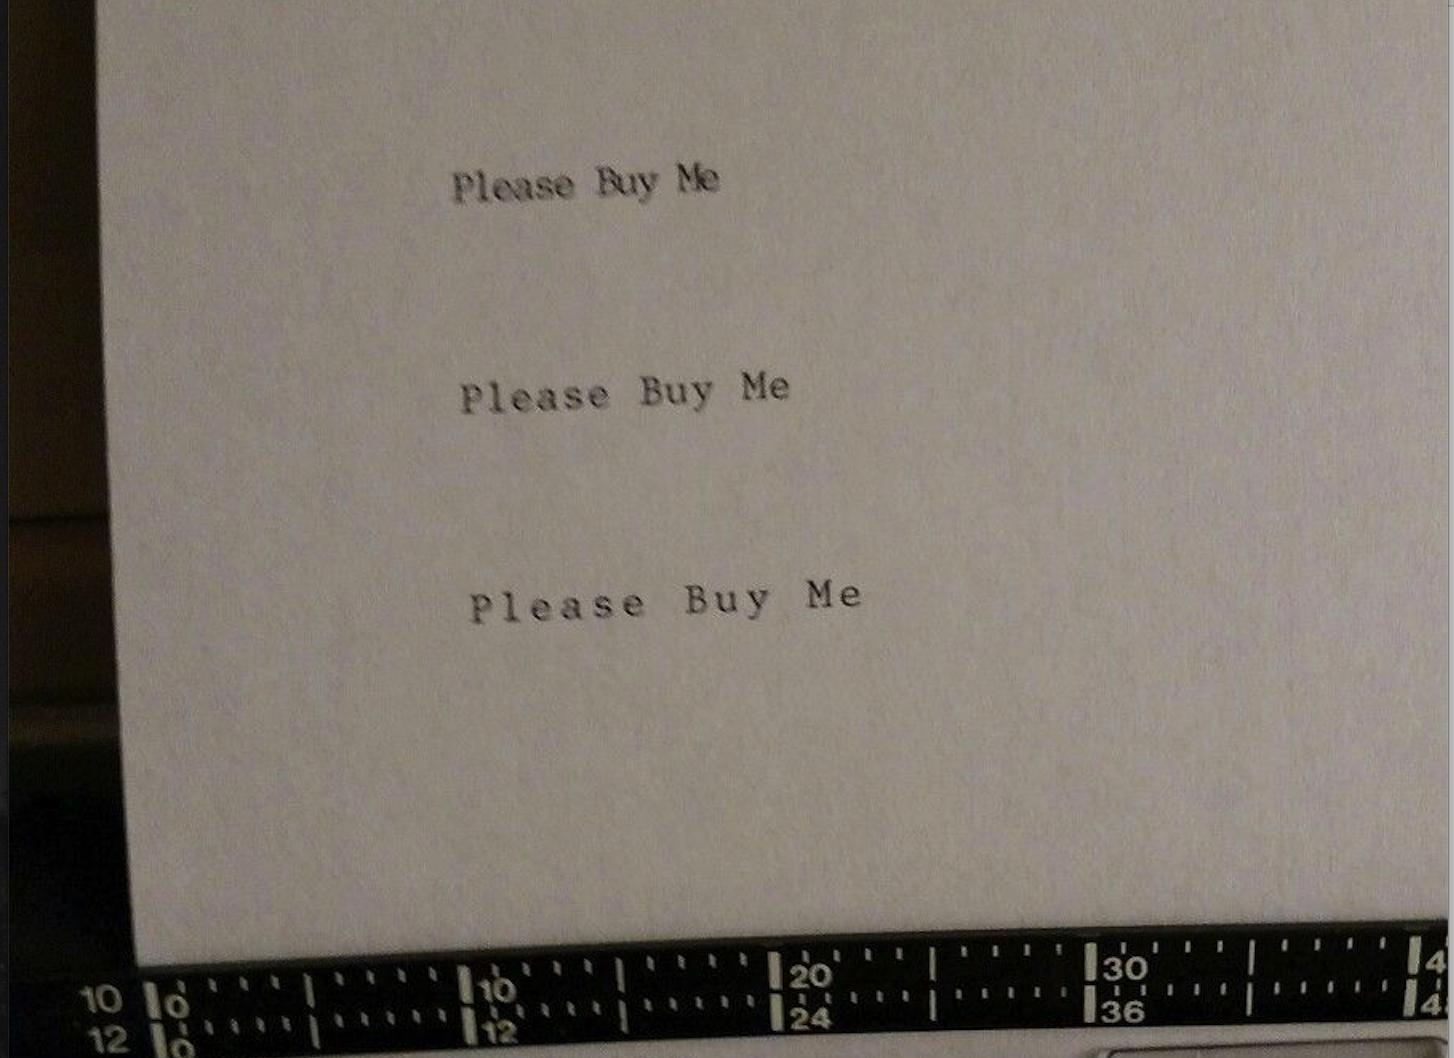 Slightly disturbing typewriter auction photos on ebay